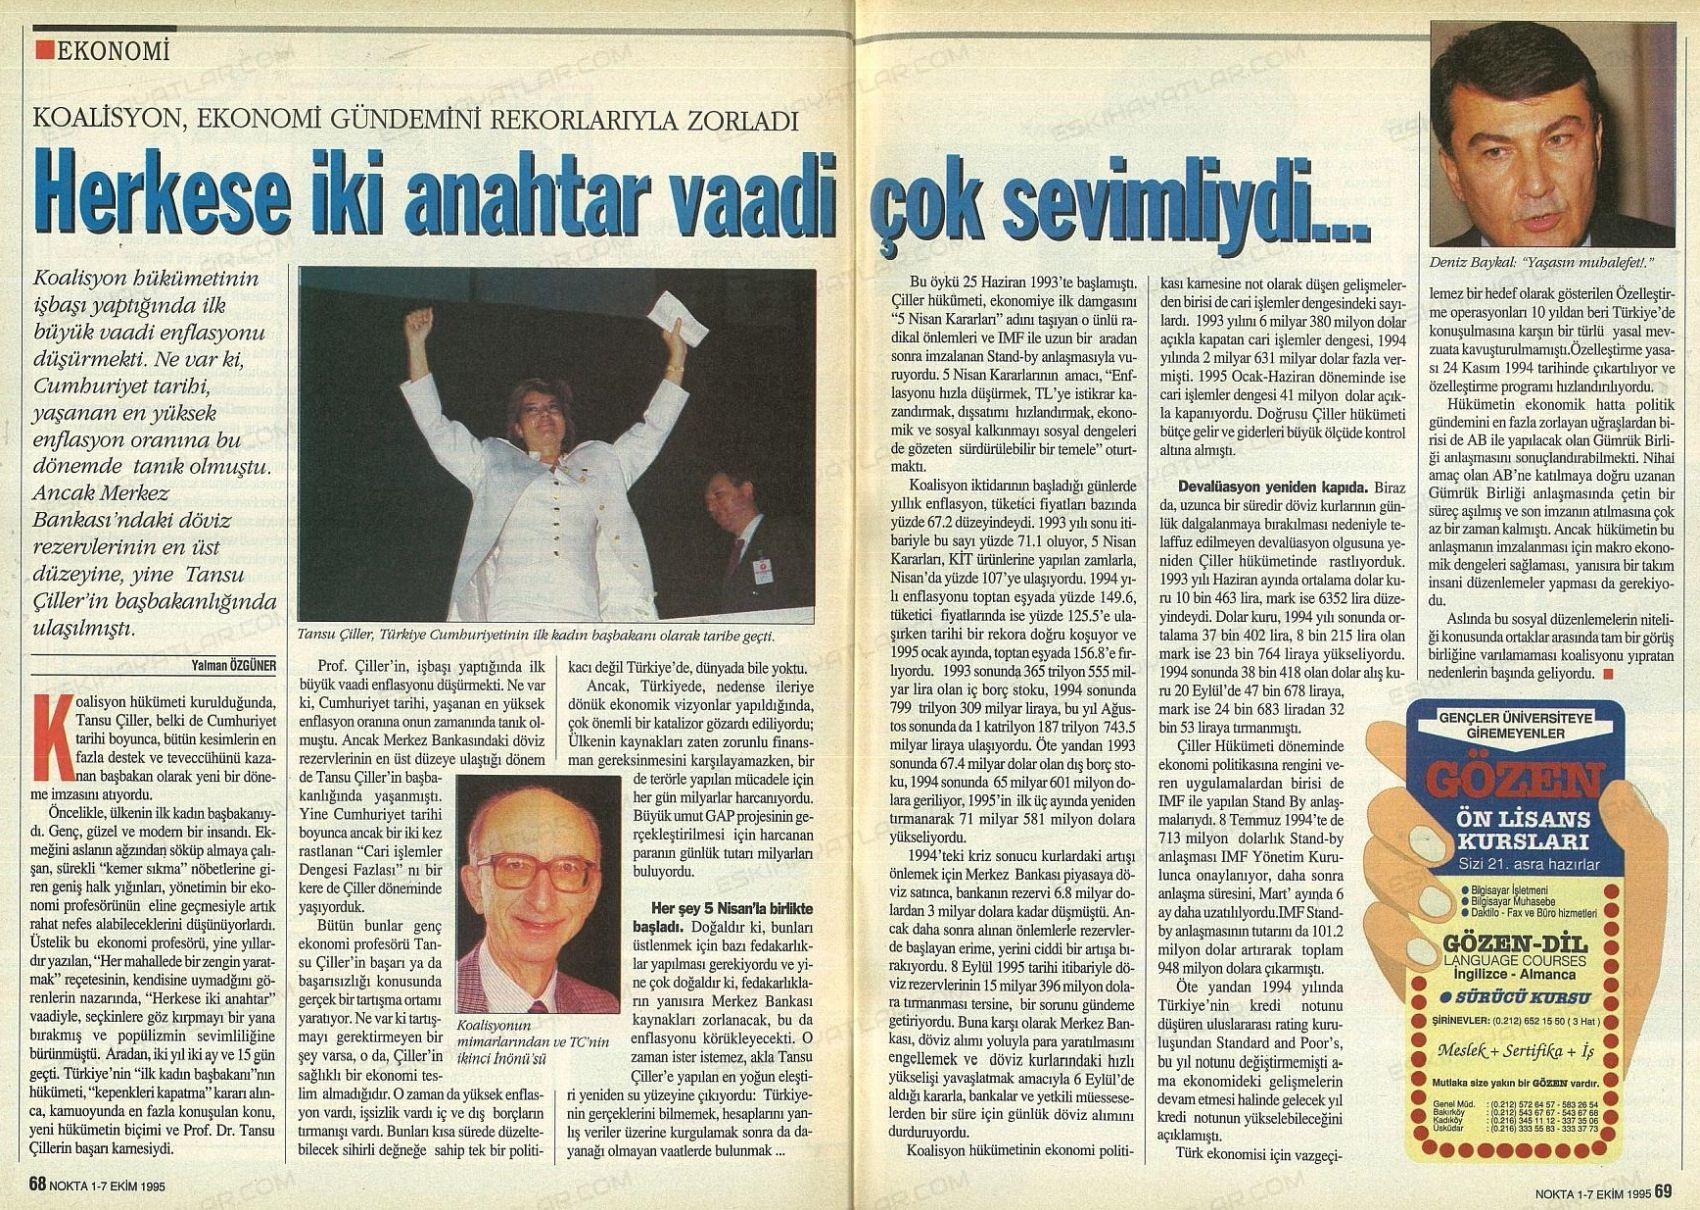 0154-tansu-ciller-1994-yili-haberleri-herkese-iki-anahtar-vaadi